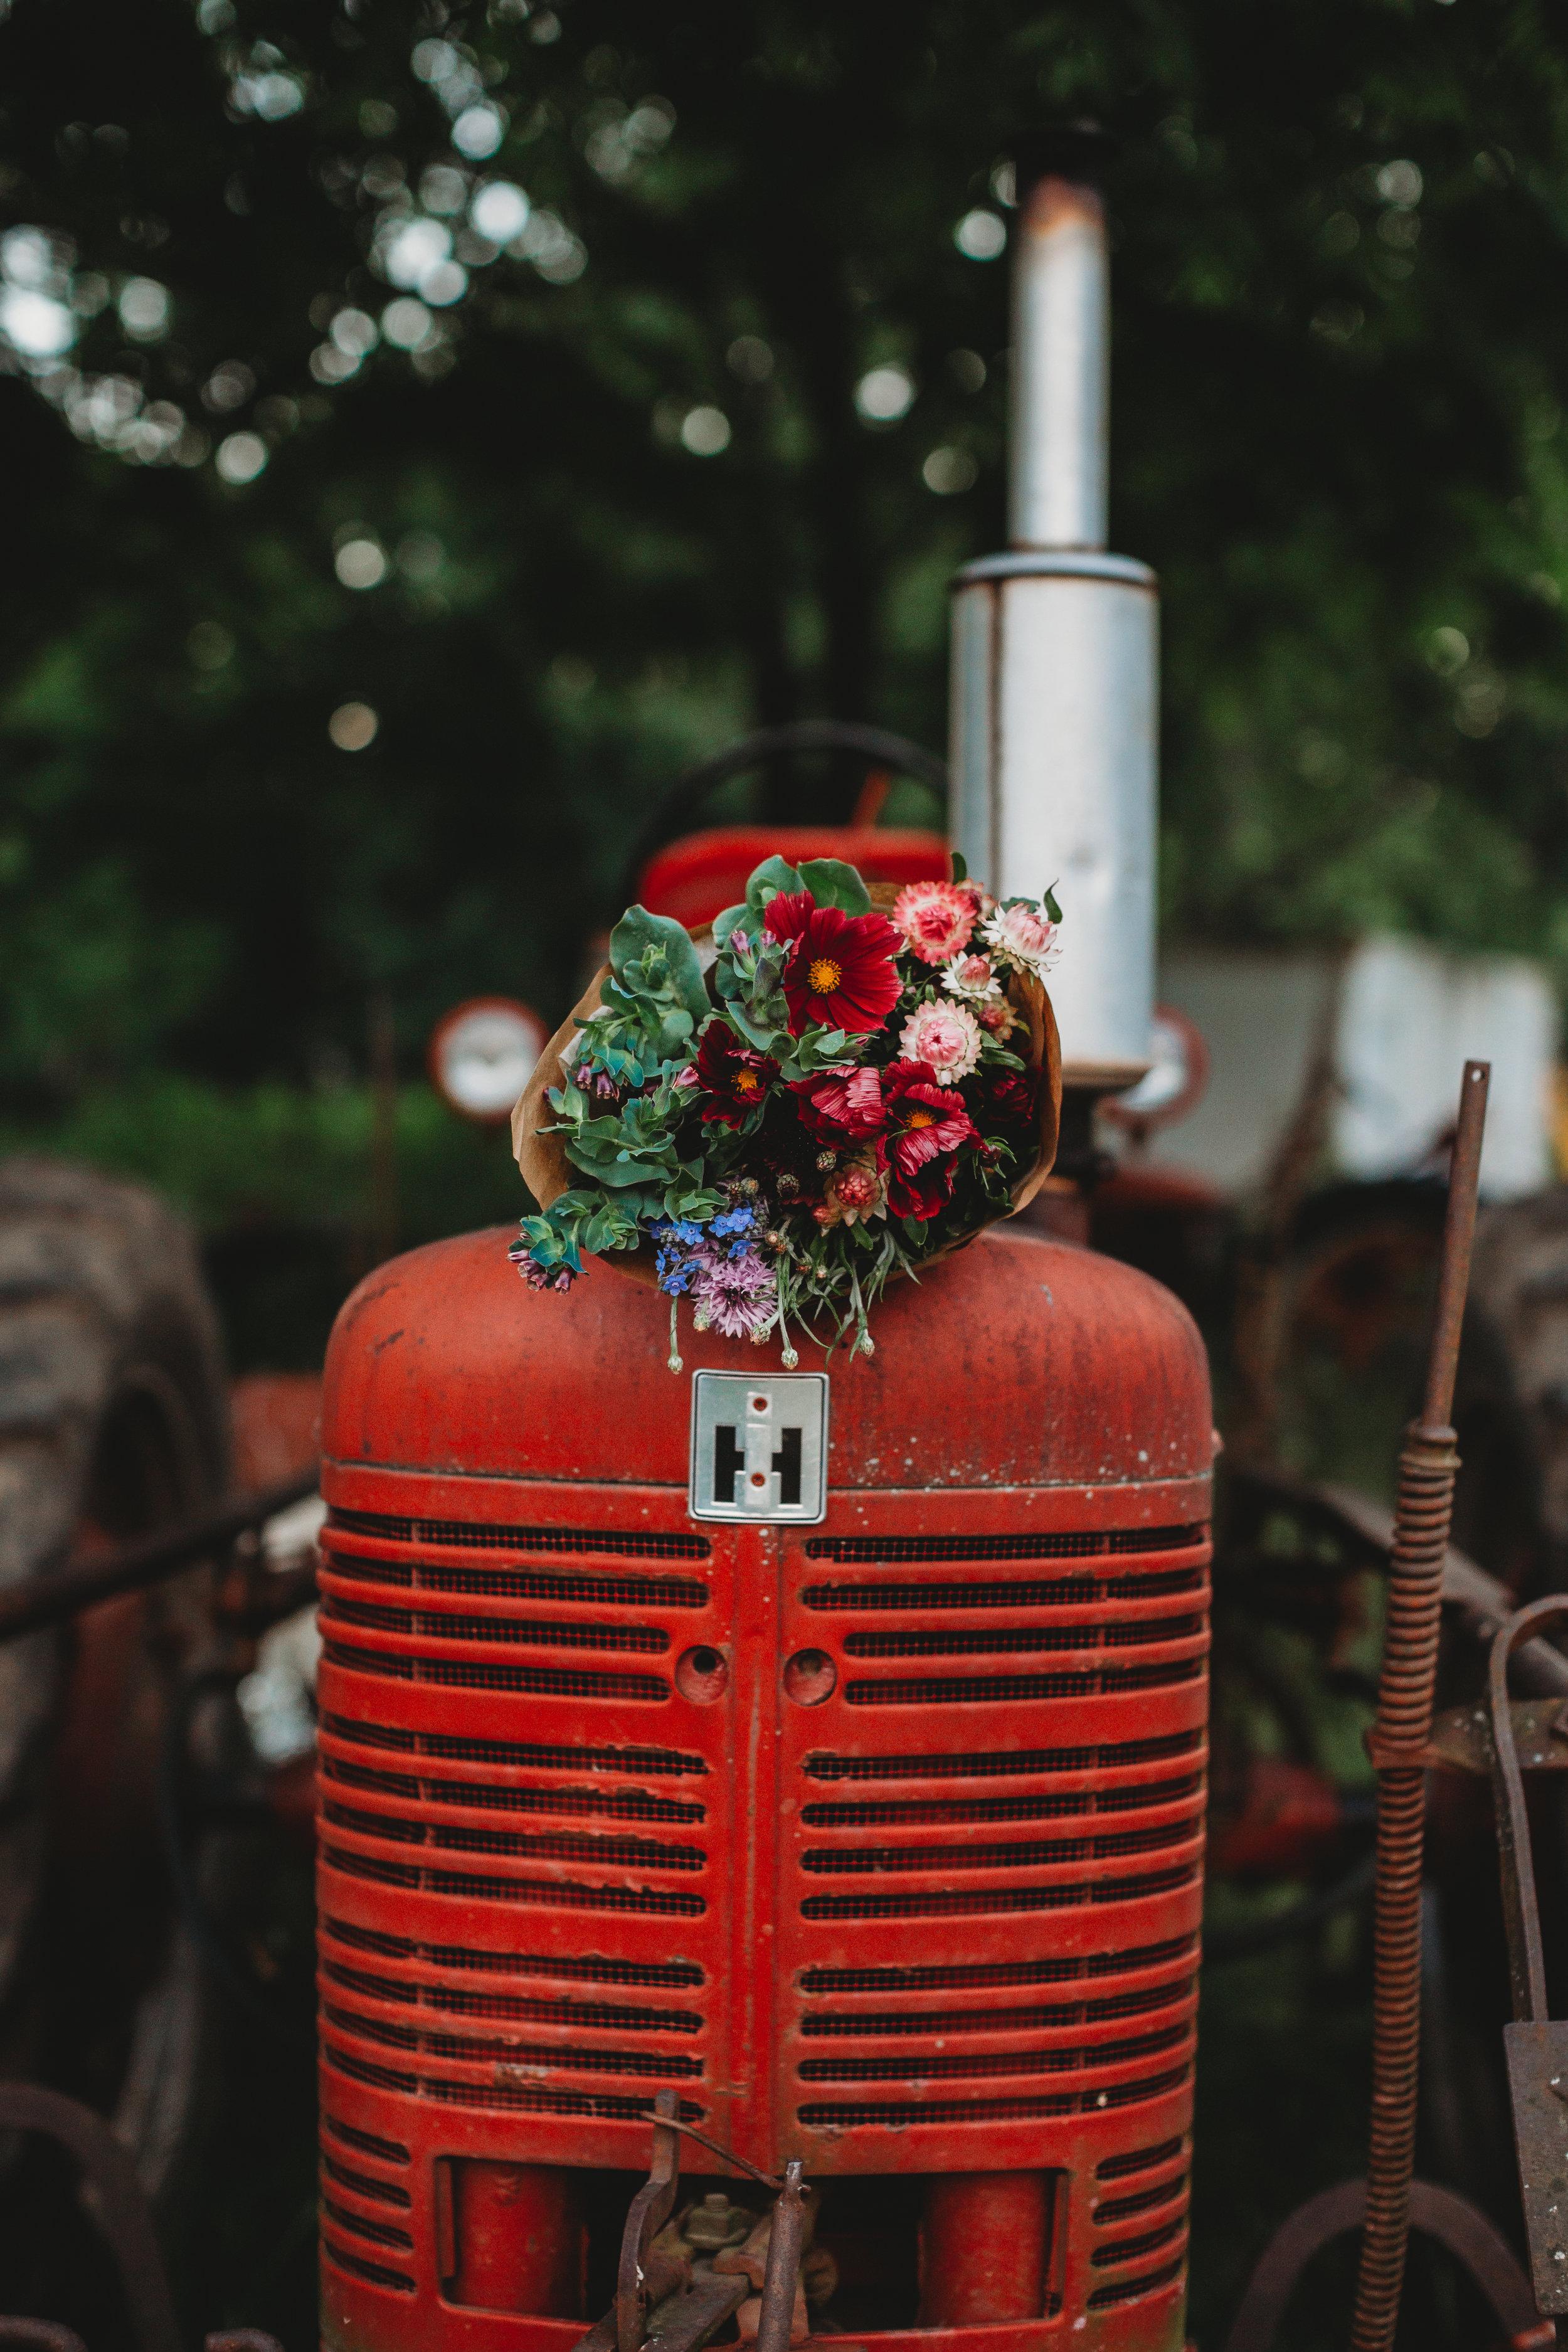 field-edge-flowers-boston-lifestyle-branding-photographer-joy-leduc-22.jpg